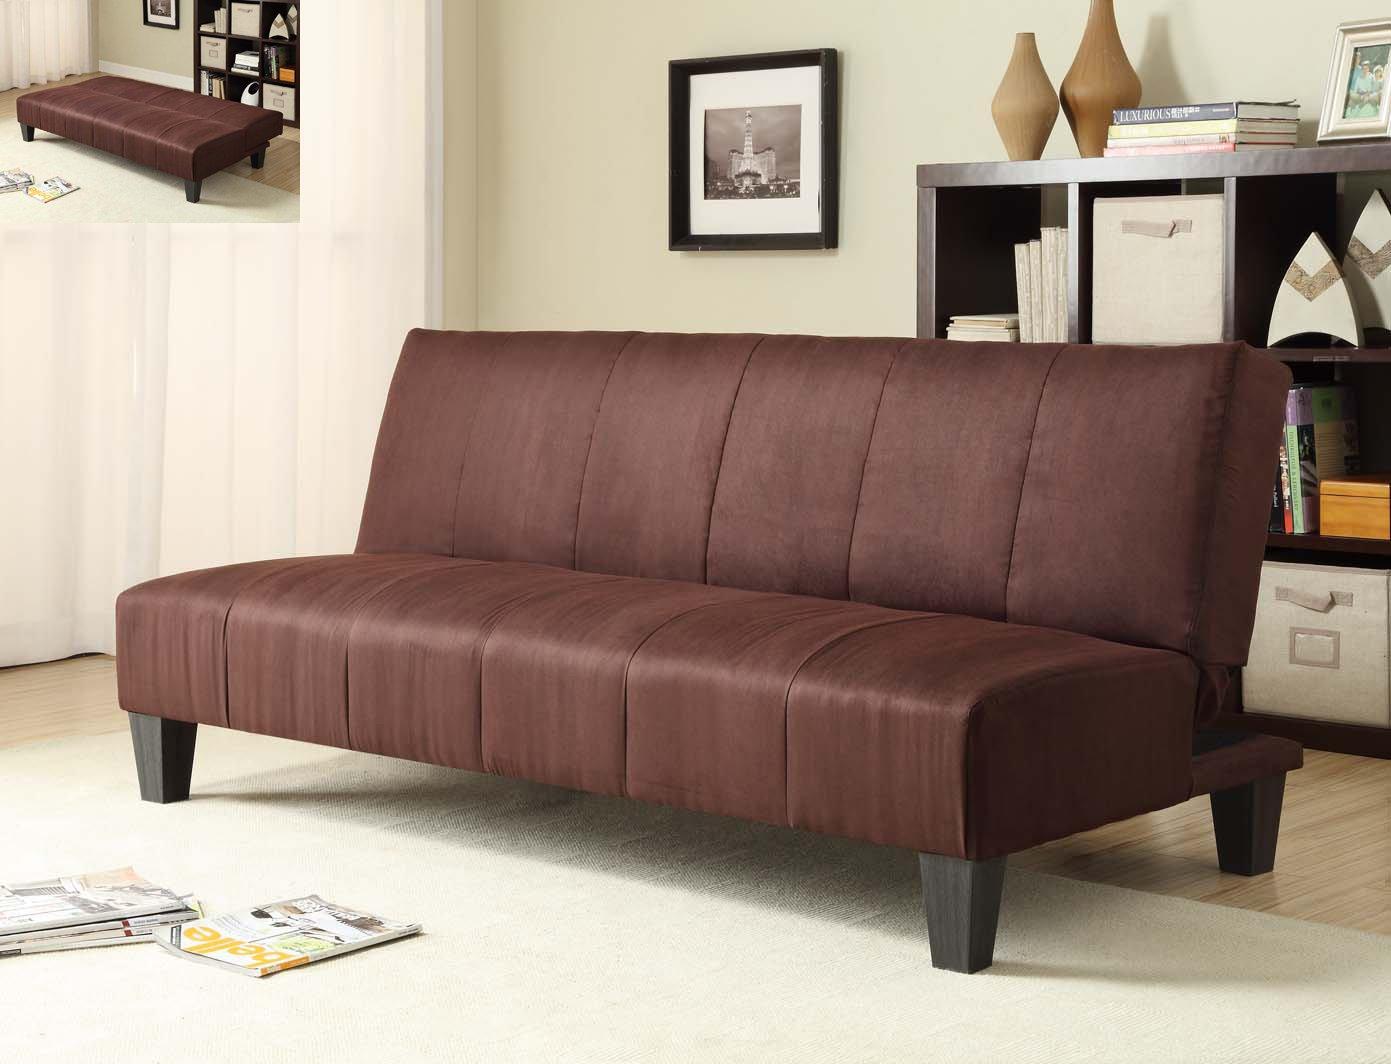 amazoncom milton greens stars winchester microfiber clickclack sofa bed dark brown kitchen u0026 dining